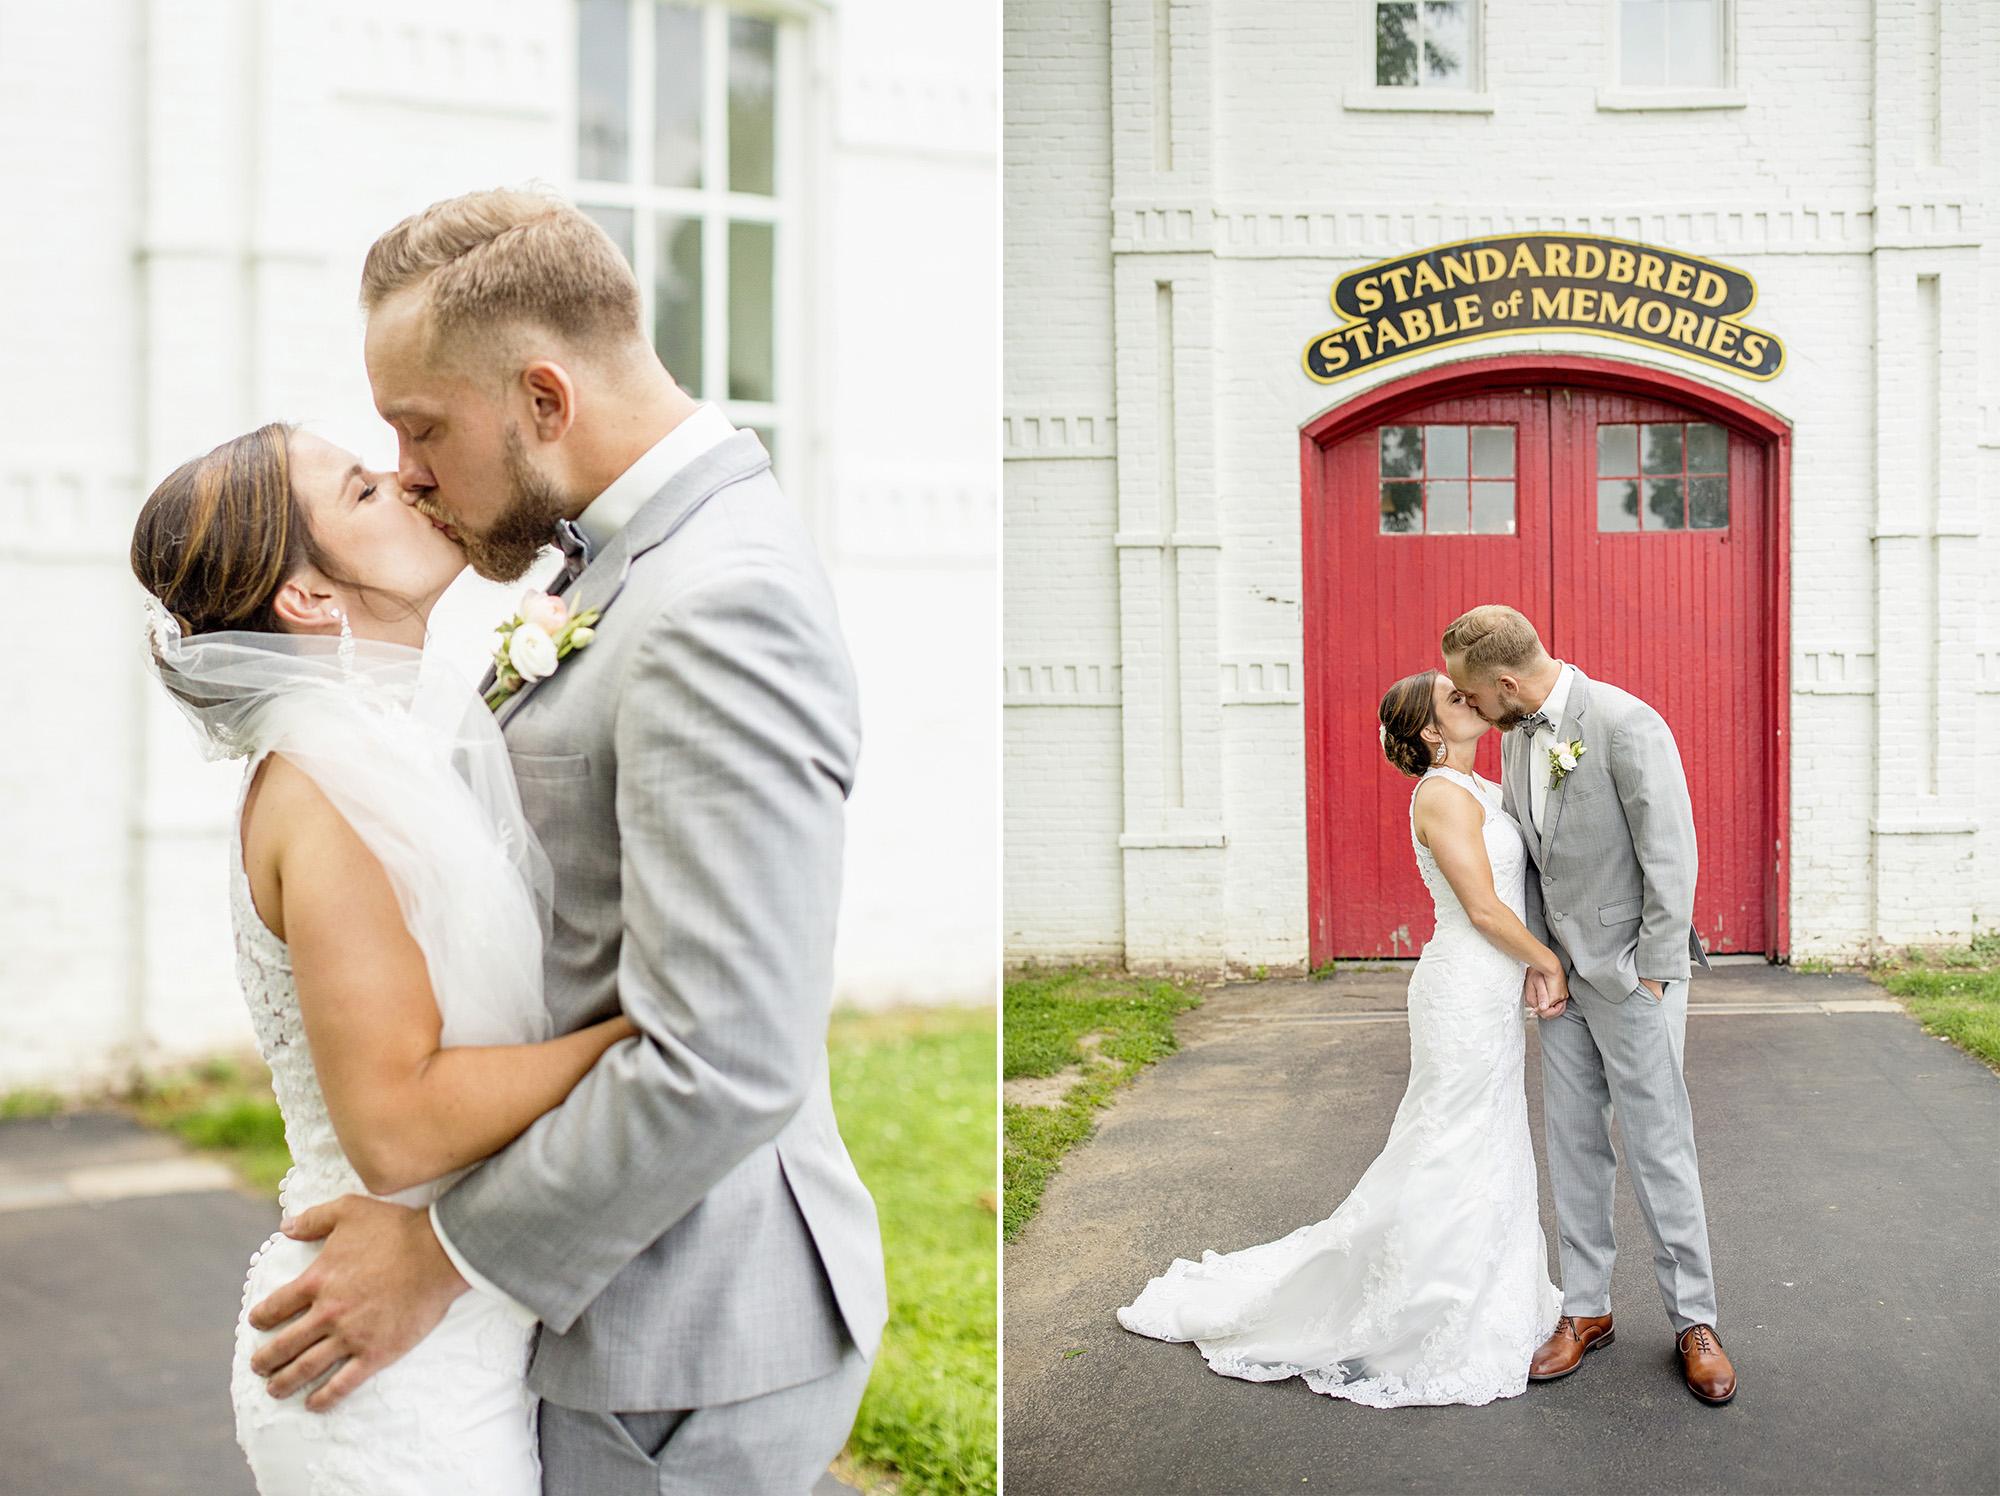 Seriously_Sabrina_Photography_Lexington_Kentucky_Round_Barn_Red_Mile_Stable_of_Memories_Wedding_Hart_39.jpg